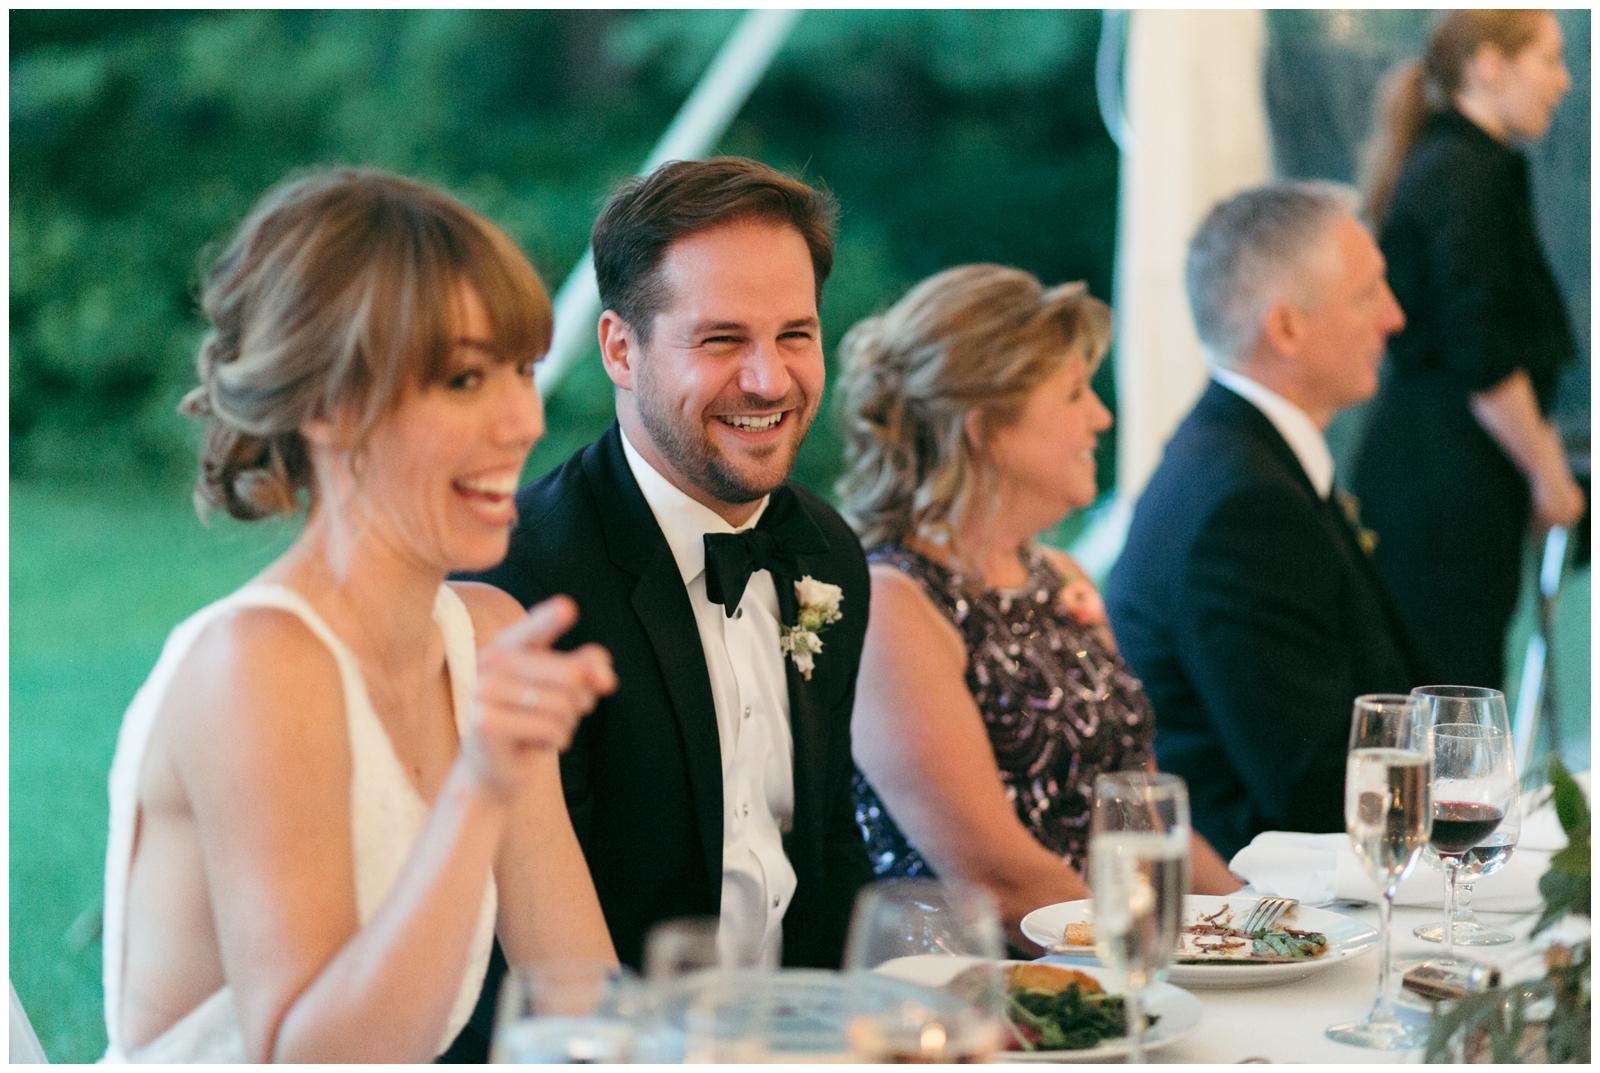 Moraine-Farm-wedding-Bailey-Q-Photo-Massachusetts-wedding-photpgrapher-135.jpg